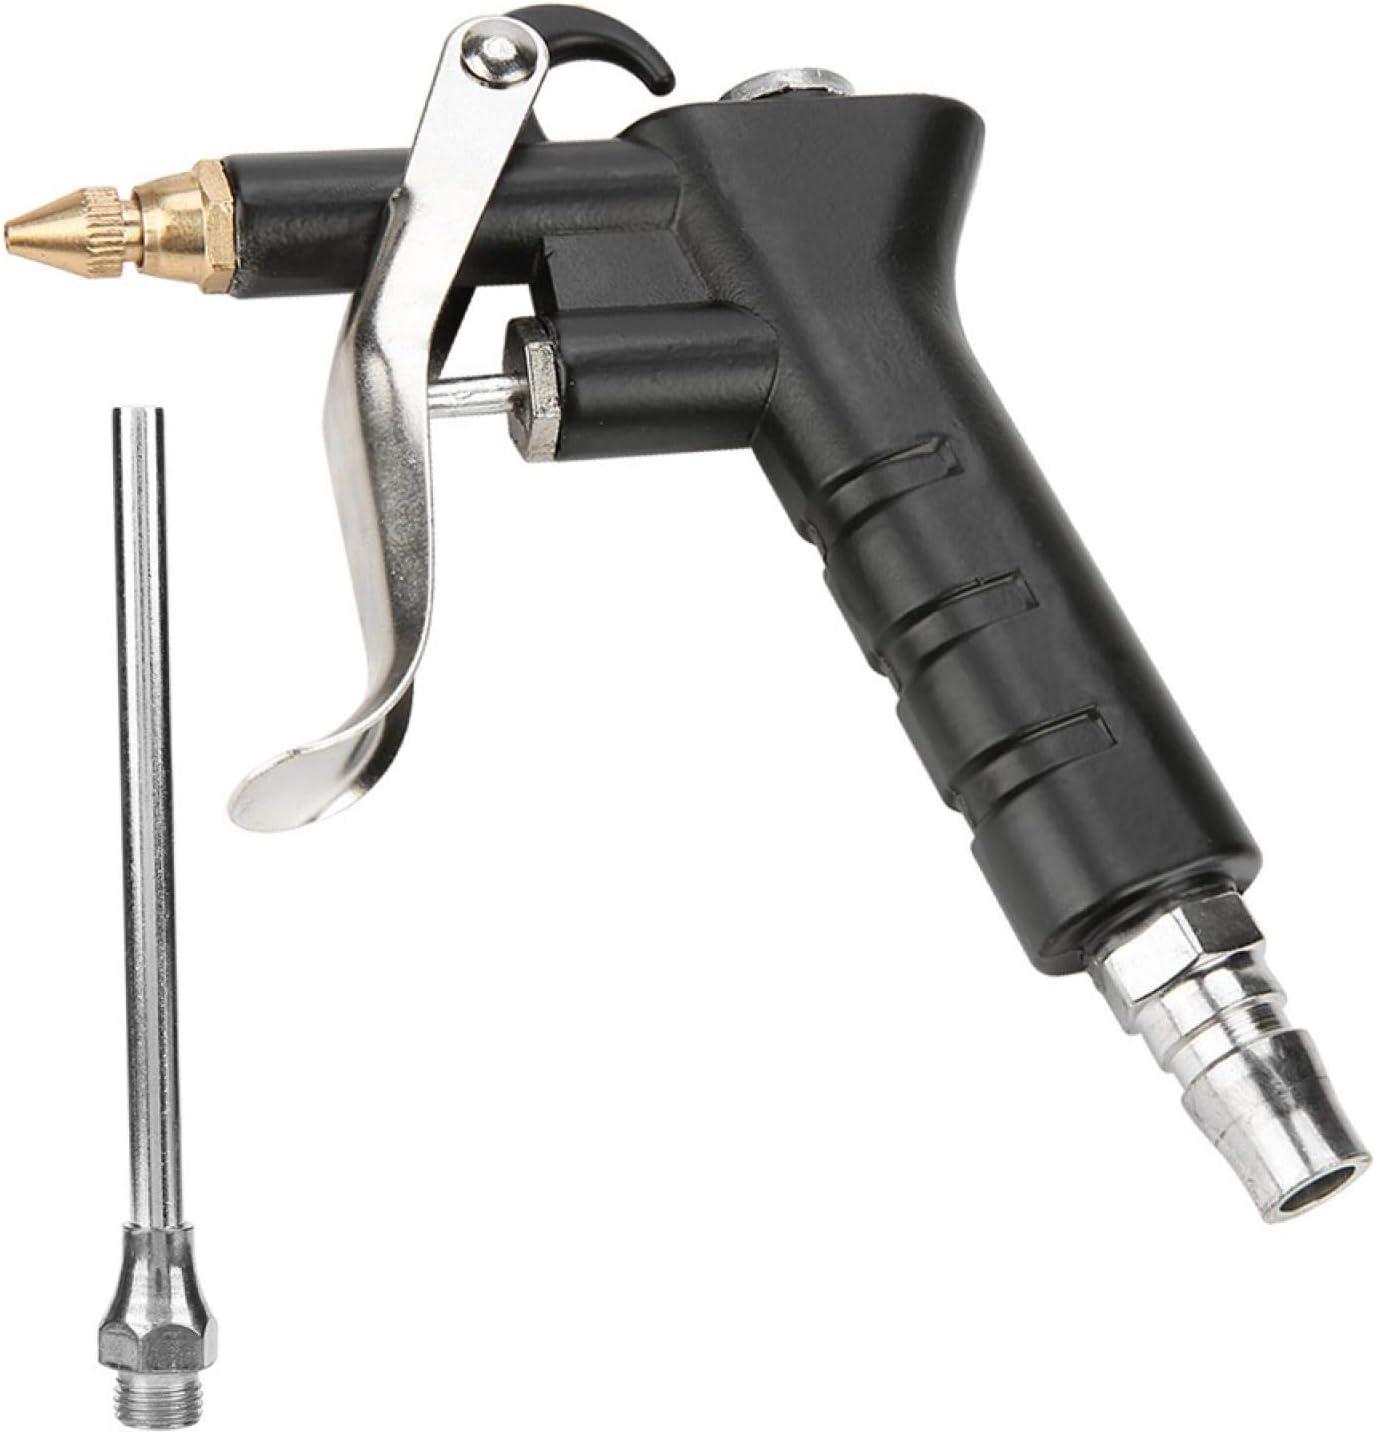 Air Spray Popular products Gun High Direct stock discount Pressure Accessories Duster Compressor K